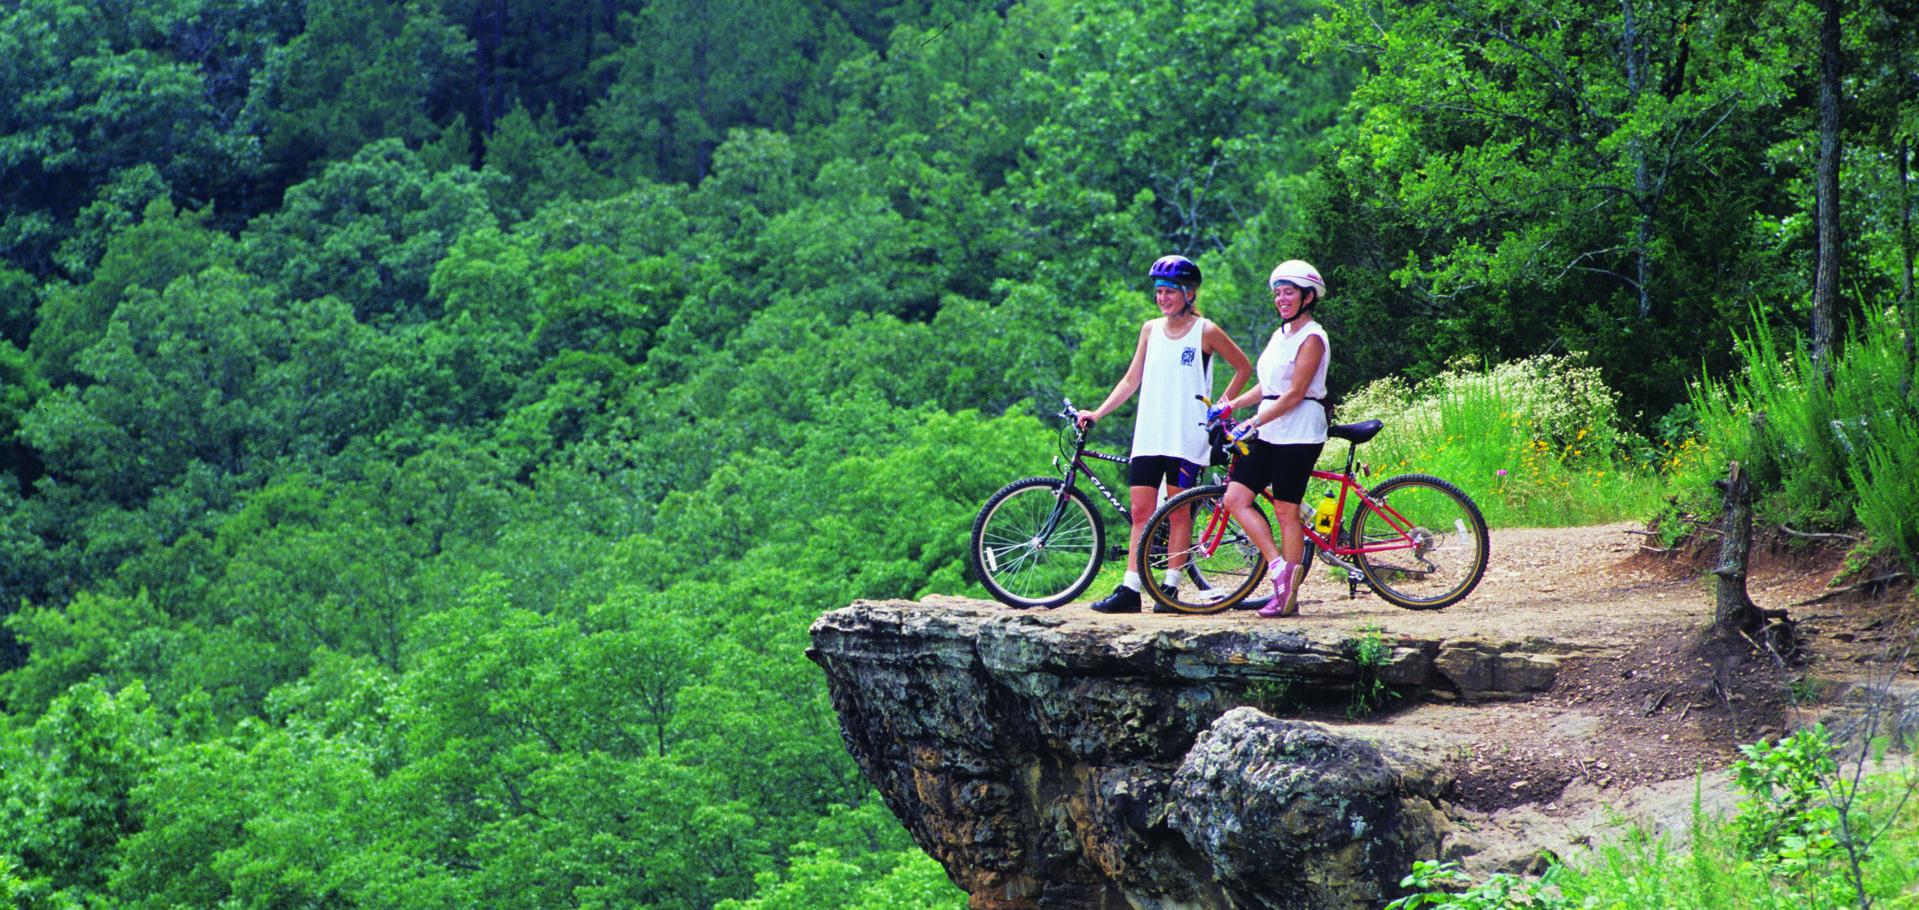 Biking Trails And Mountain Biking Travelok Com